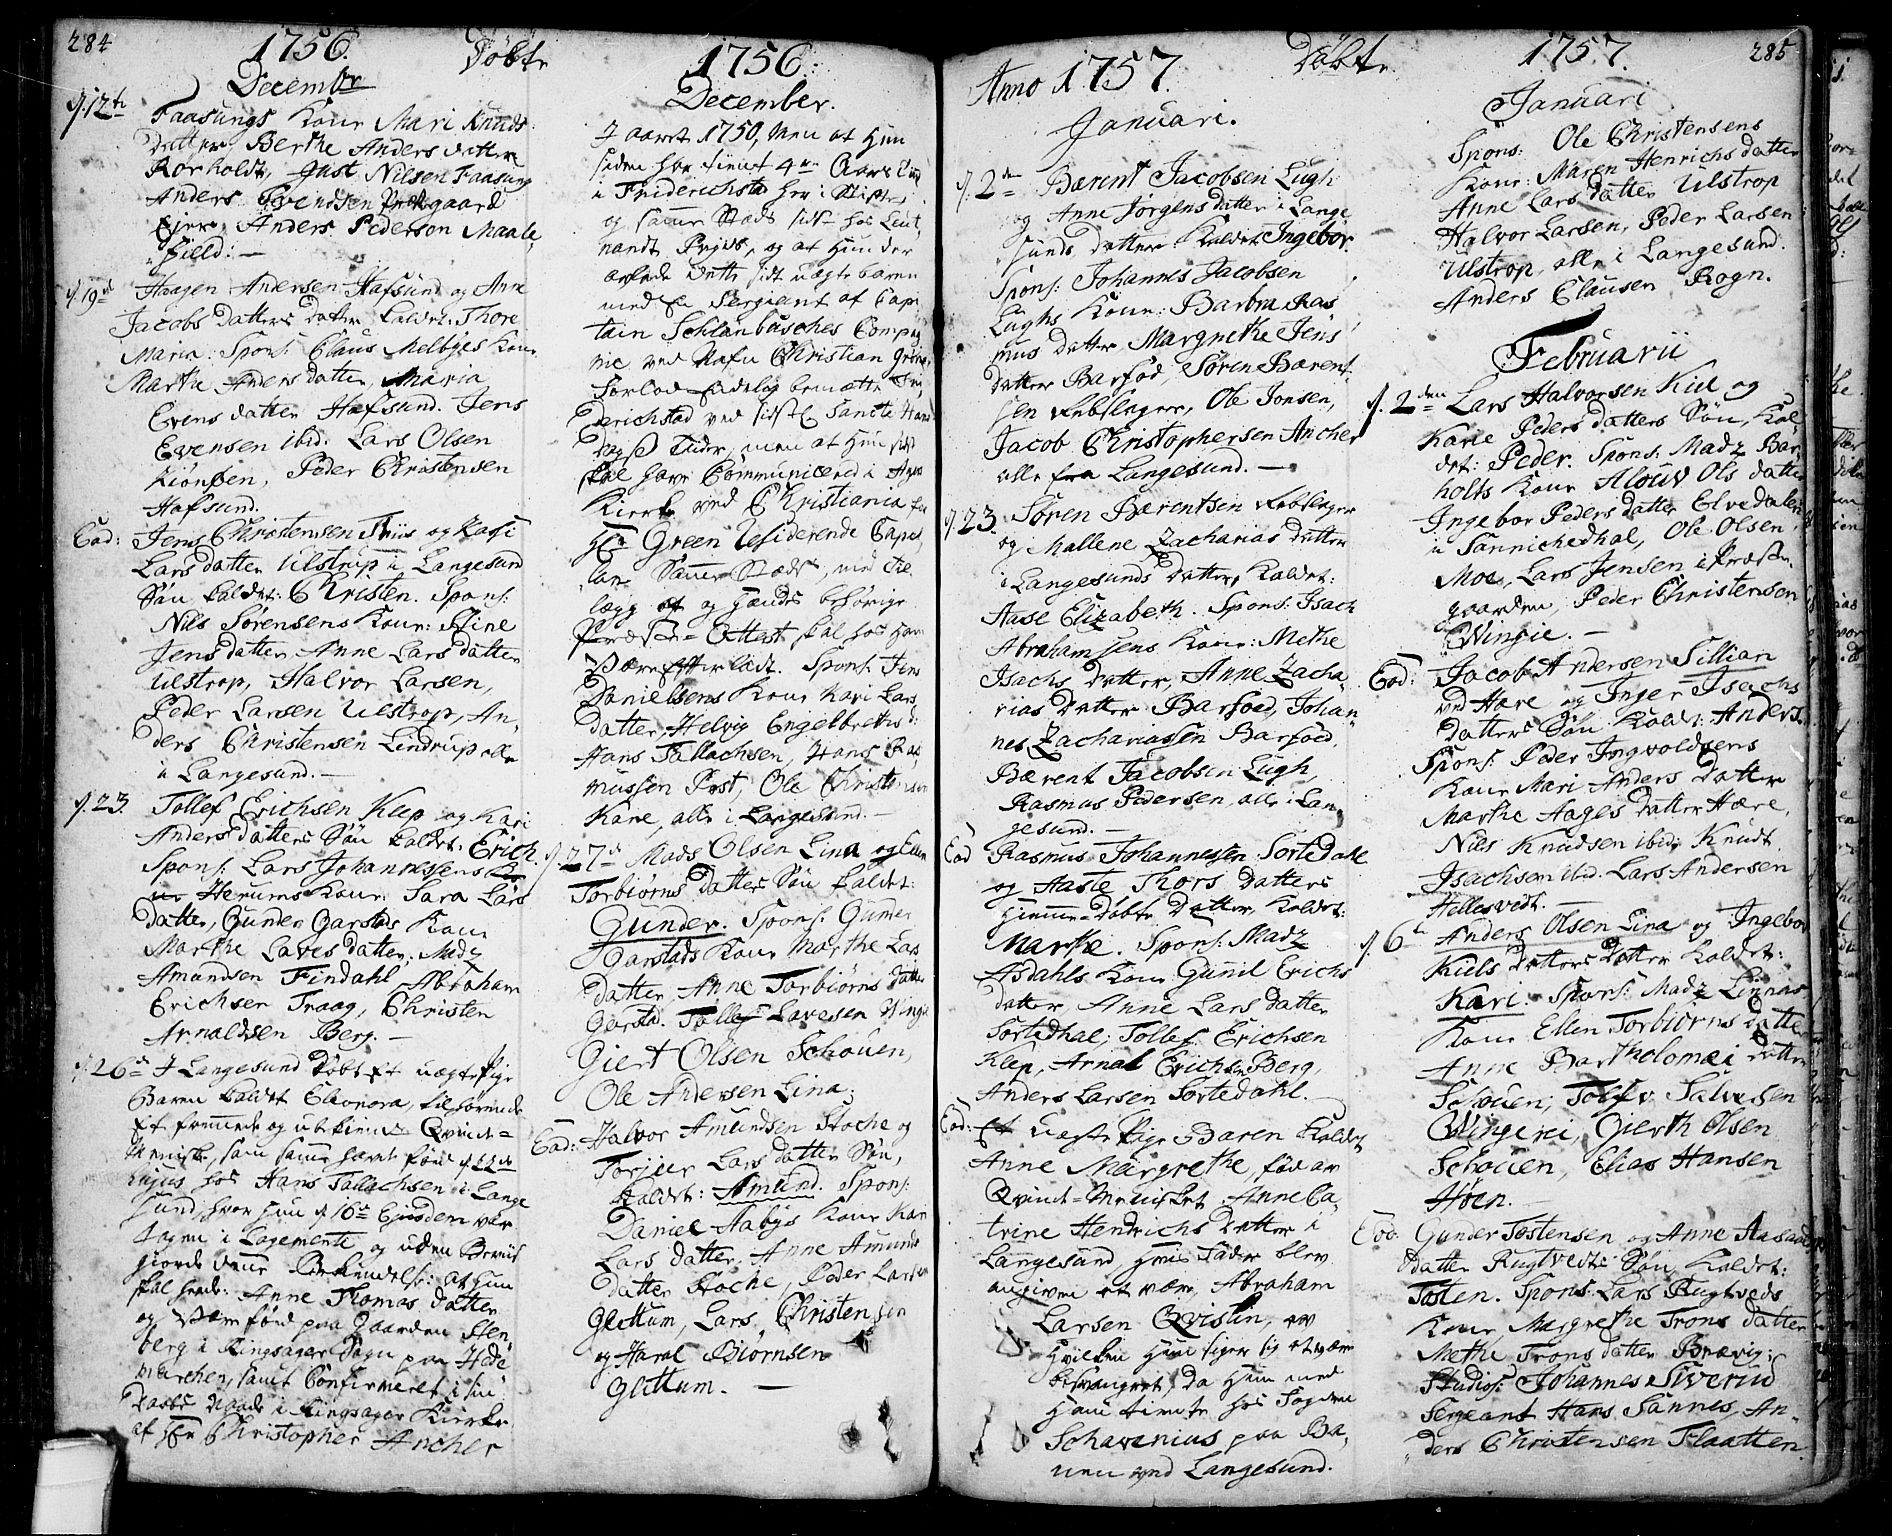 SAKO, Bamble kirkebøker, F/Fa/L0001: Ministerialbok nr. I 1, 1702-1774, s. 284-285